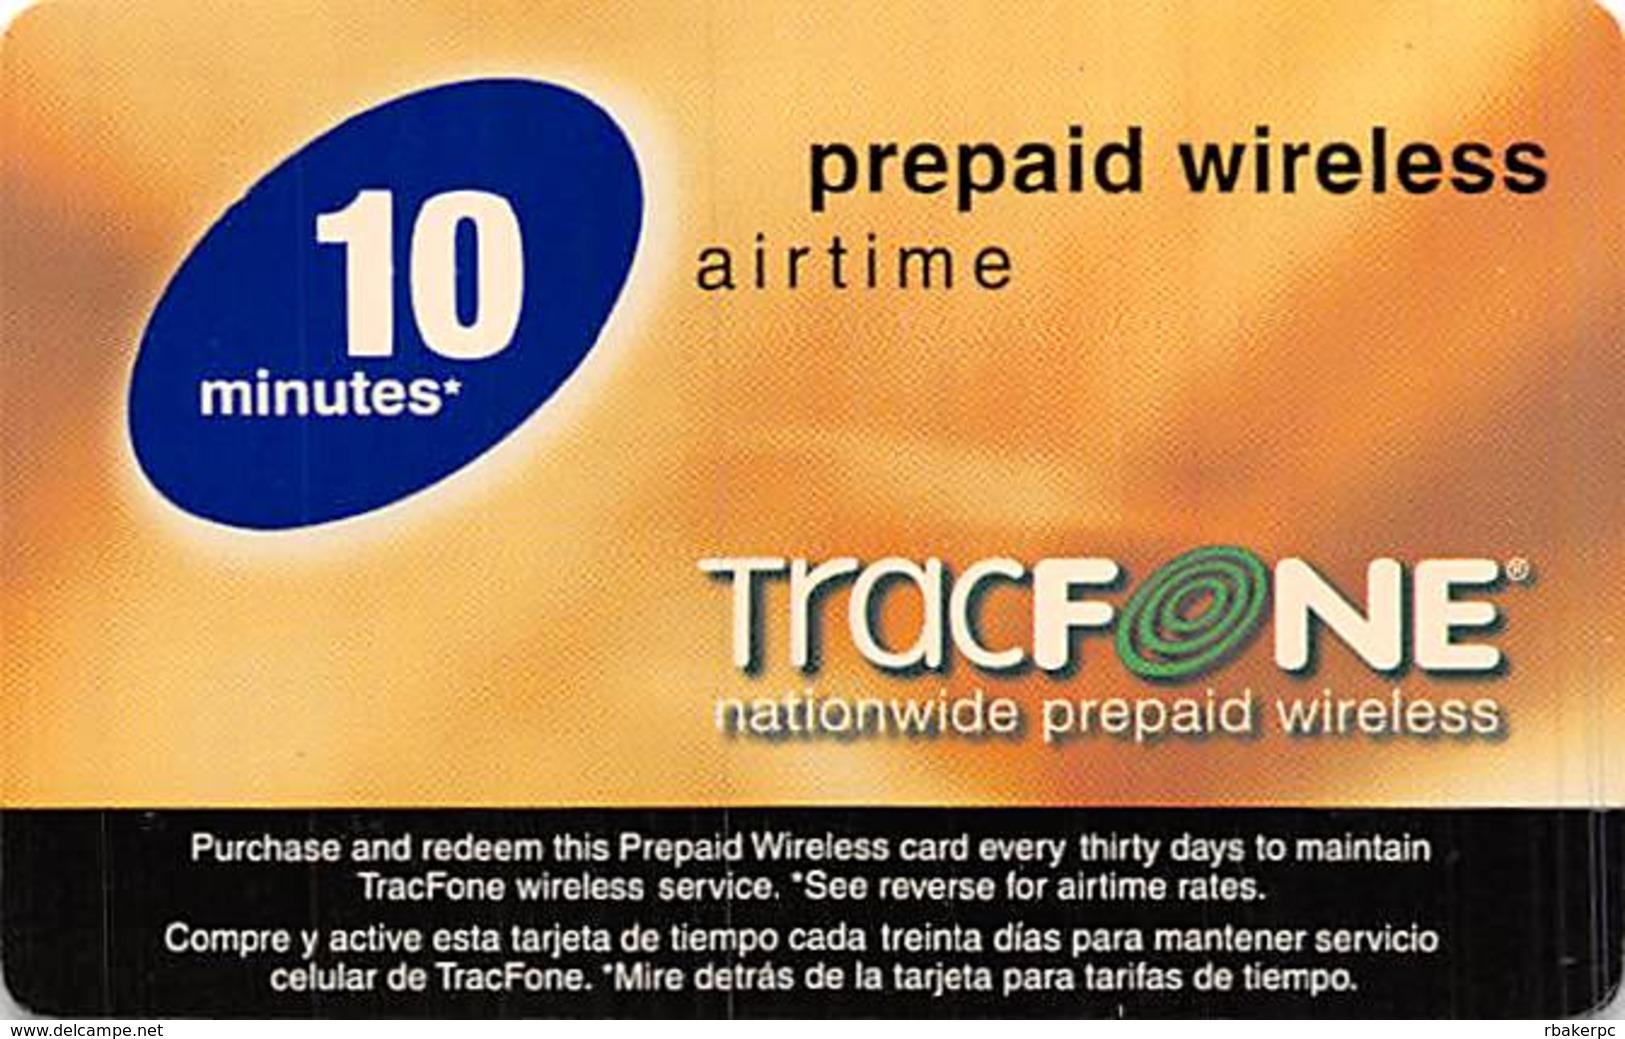 TracFONE 10 Minute Prepaid Wireless Airtime - Prepaid Phone Card - United States